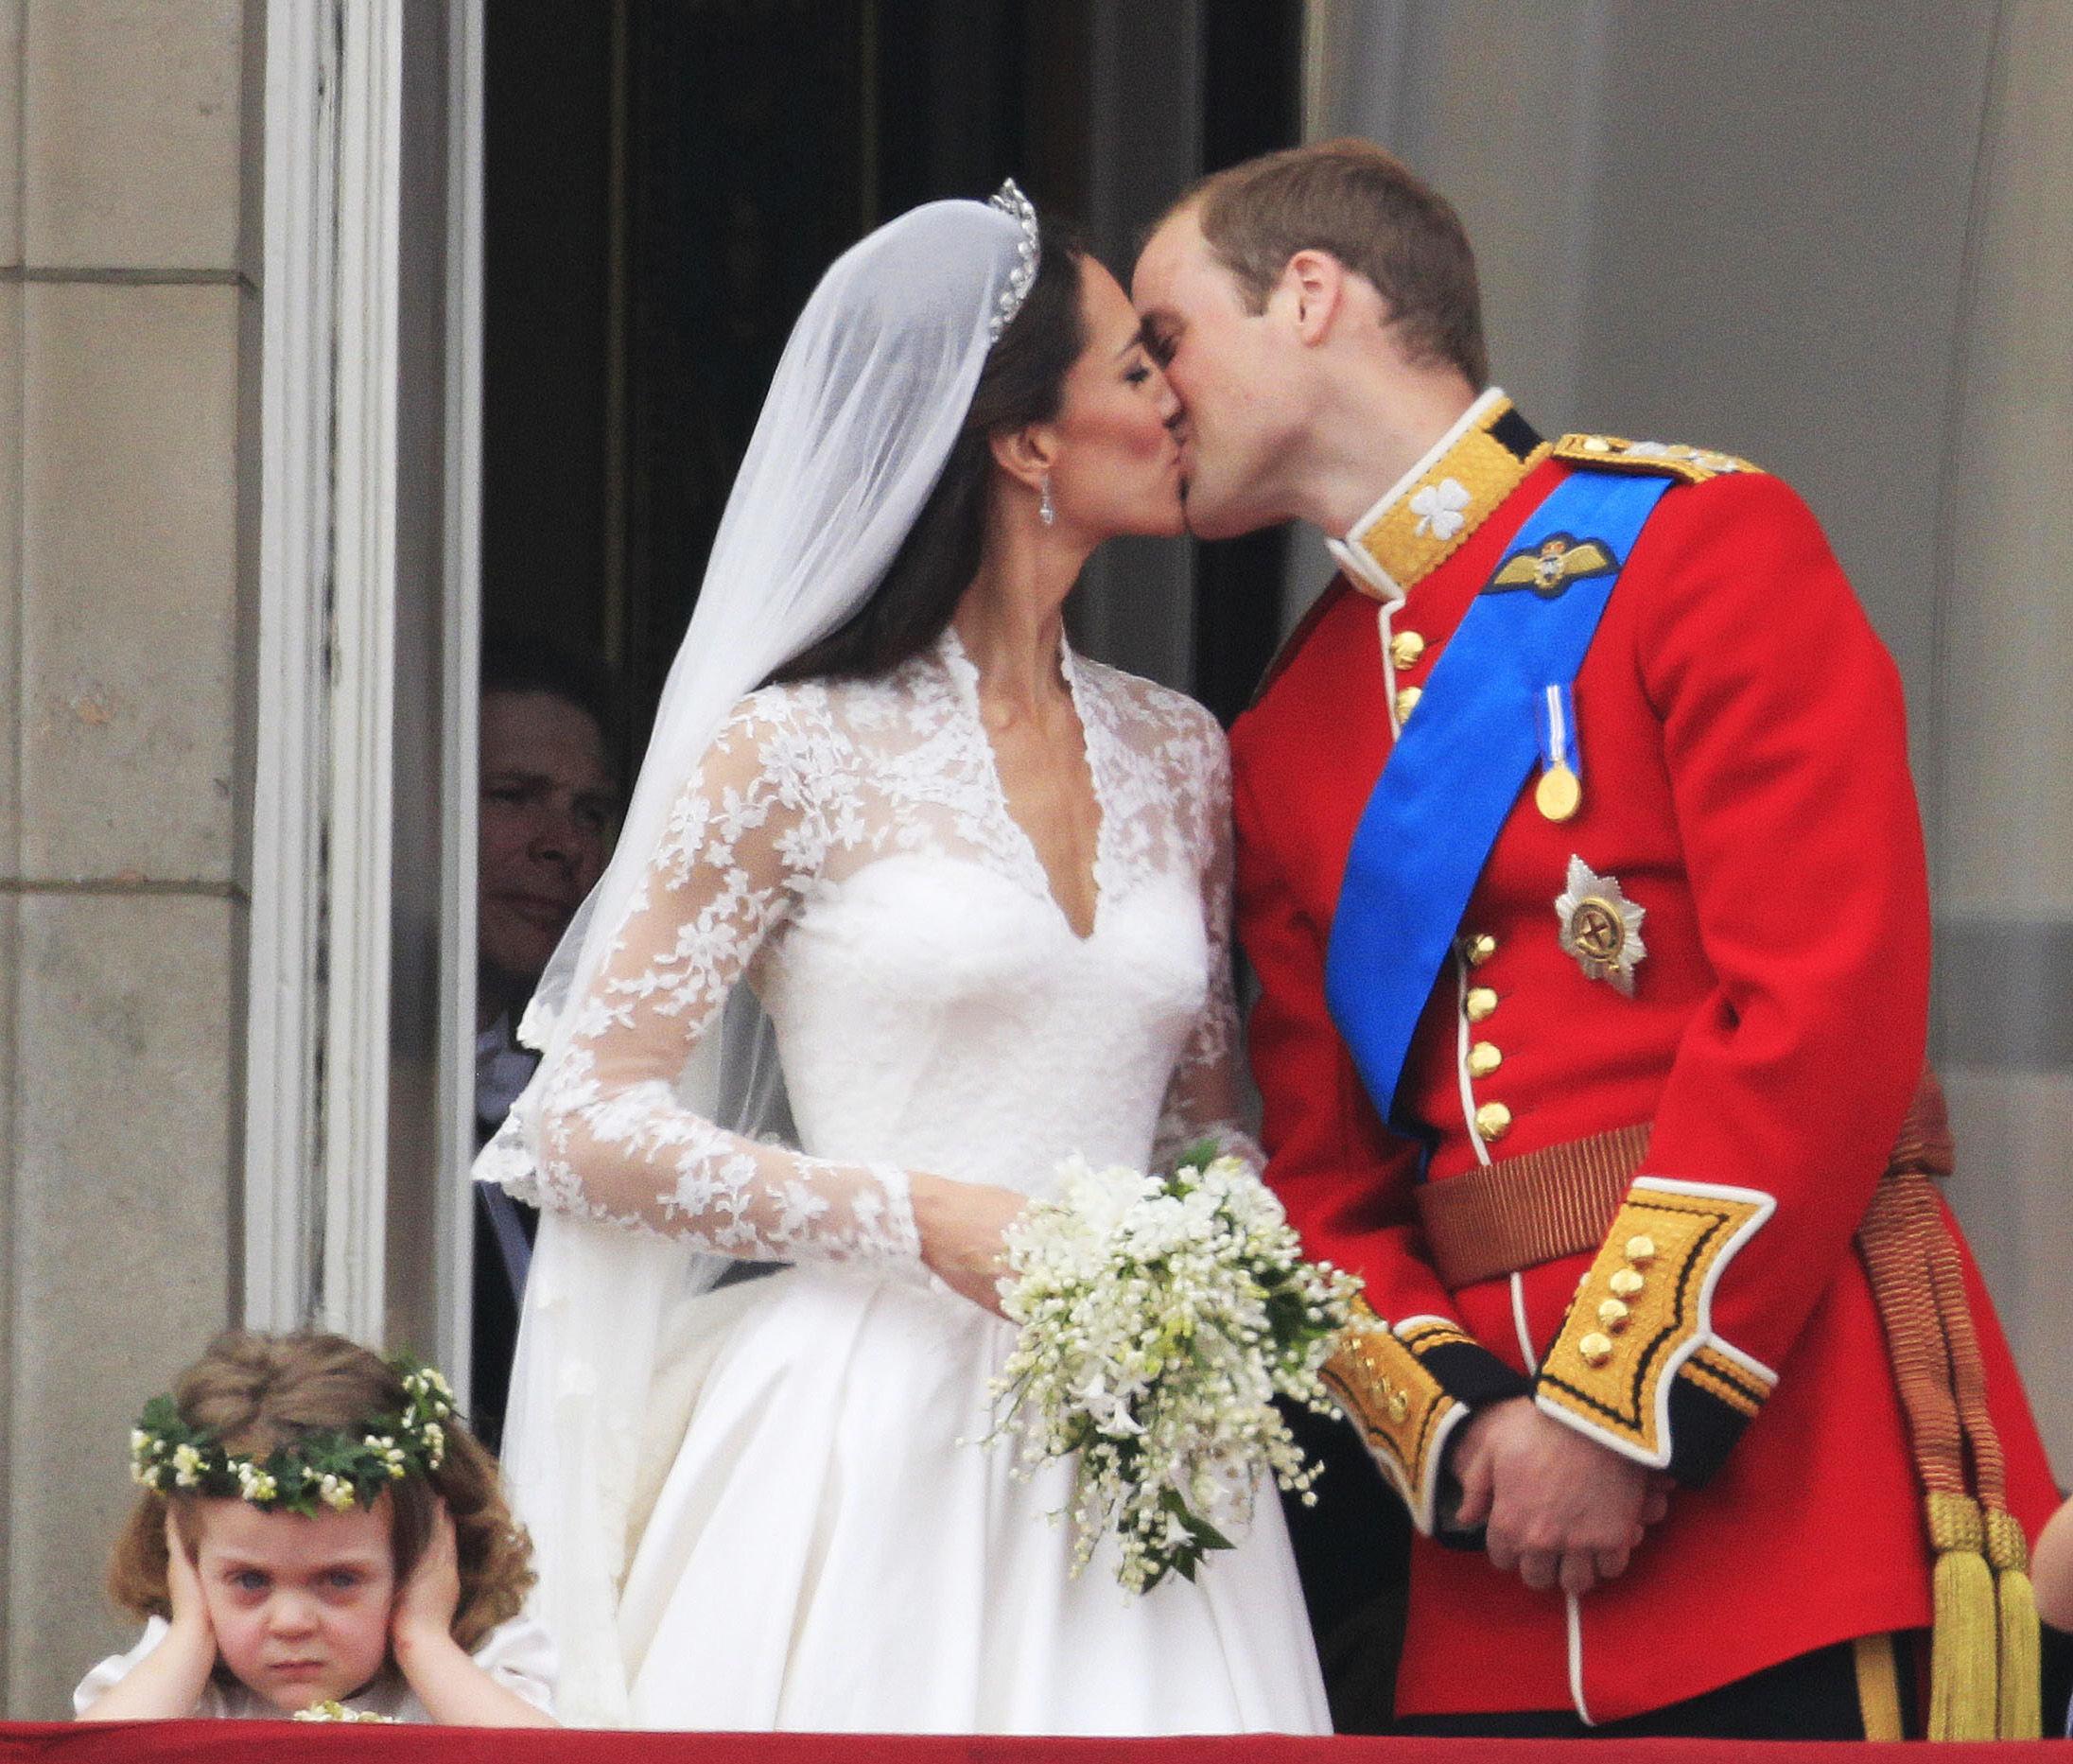 Принц Уильям целует свою жену герцогиню Кембриджскую на балконе Букингемского Дворца